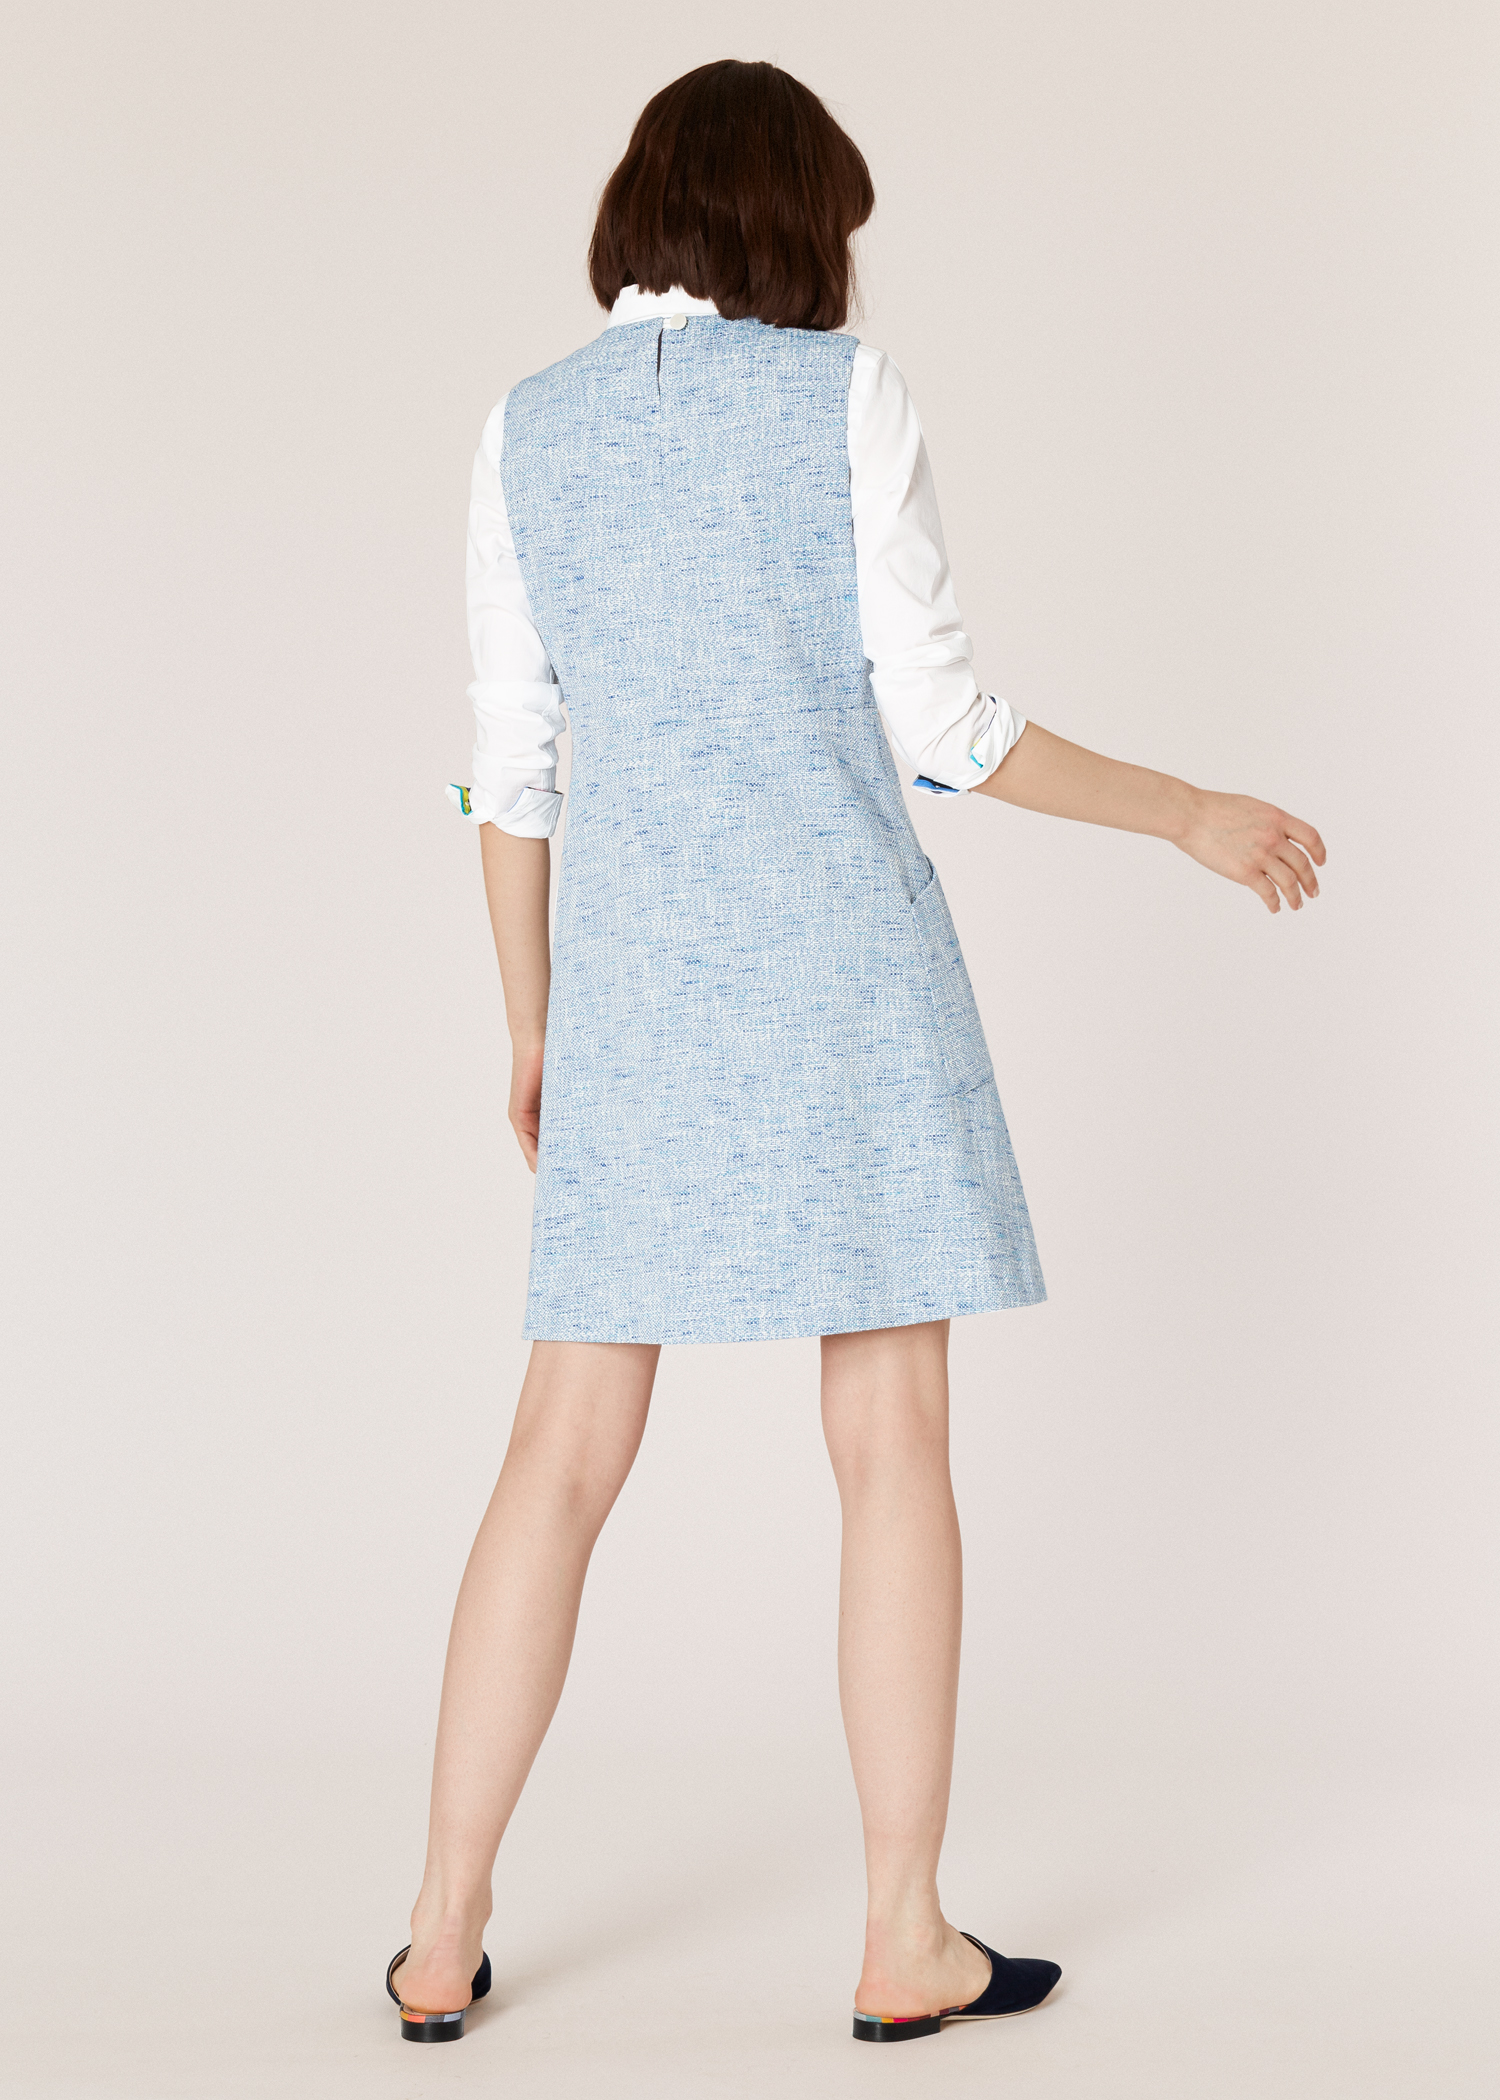 c84b7f251fd Model Back View Women S Light Blue Tweed Sleeveless Shift Dress Paul Smith